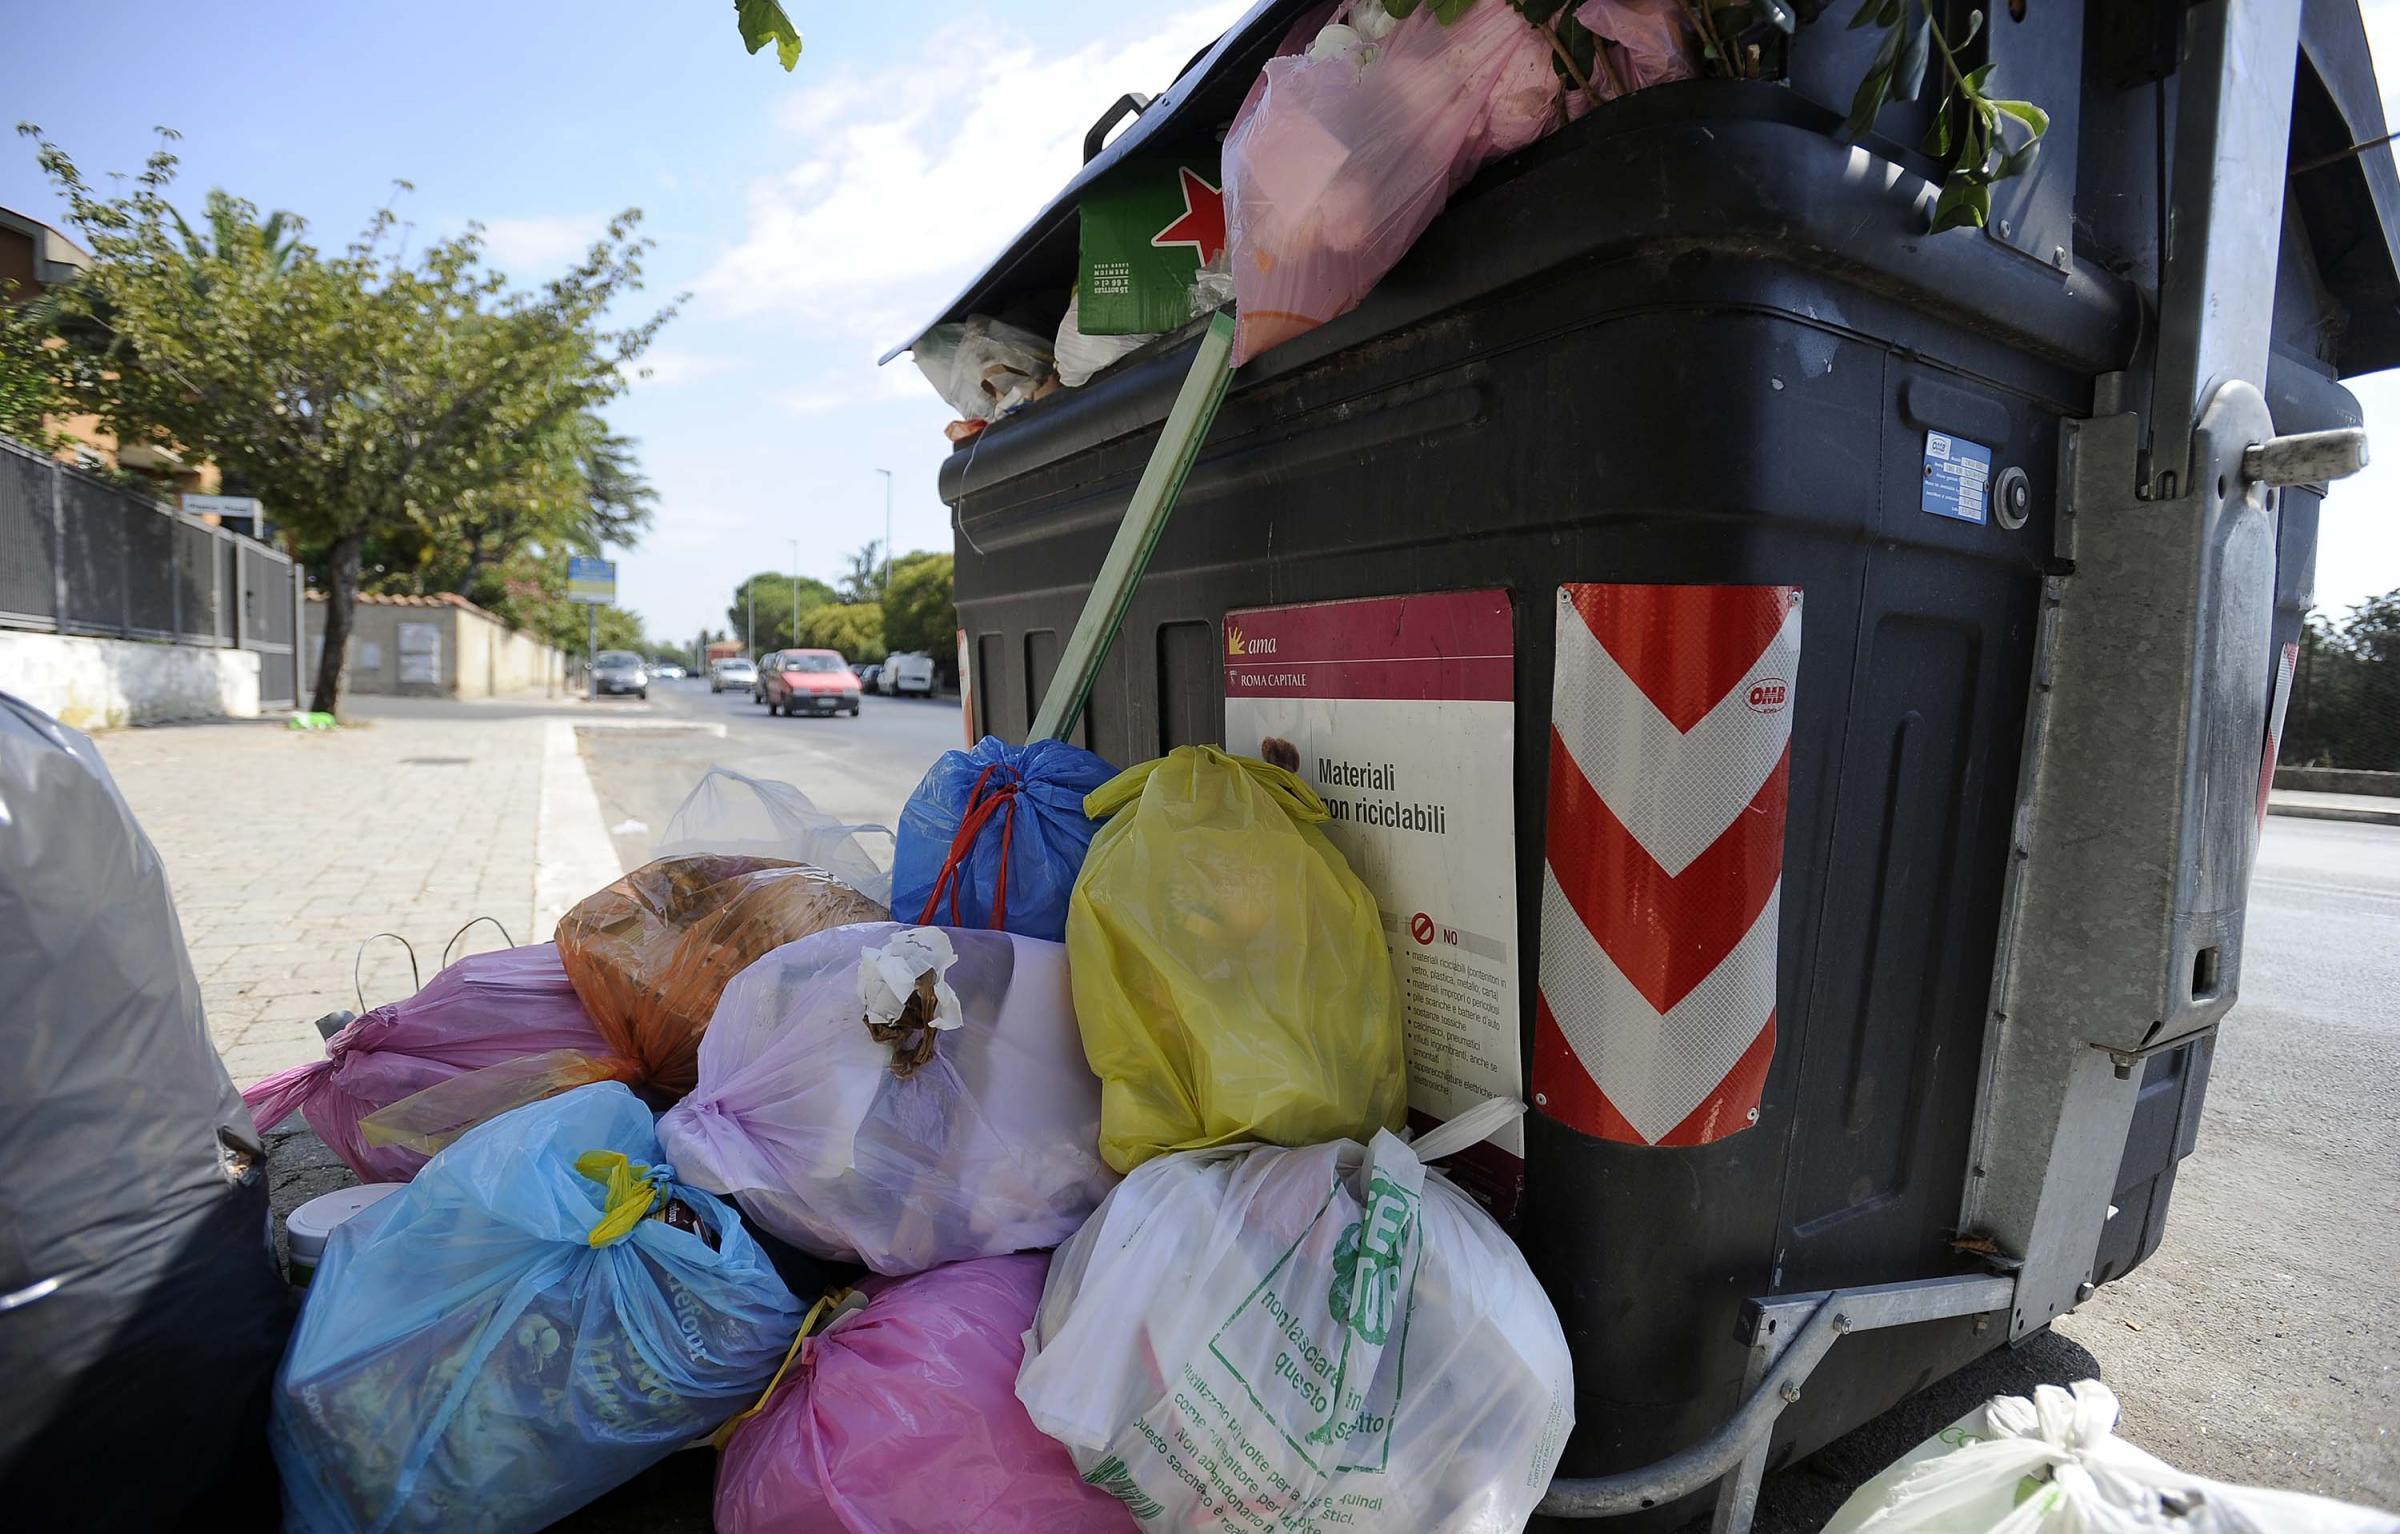 Roma e l'emergenza rifiuti